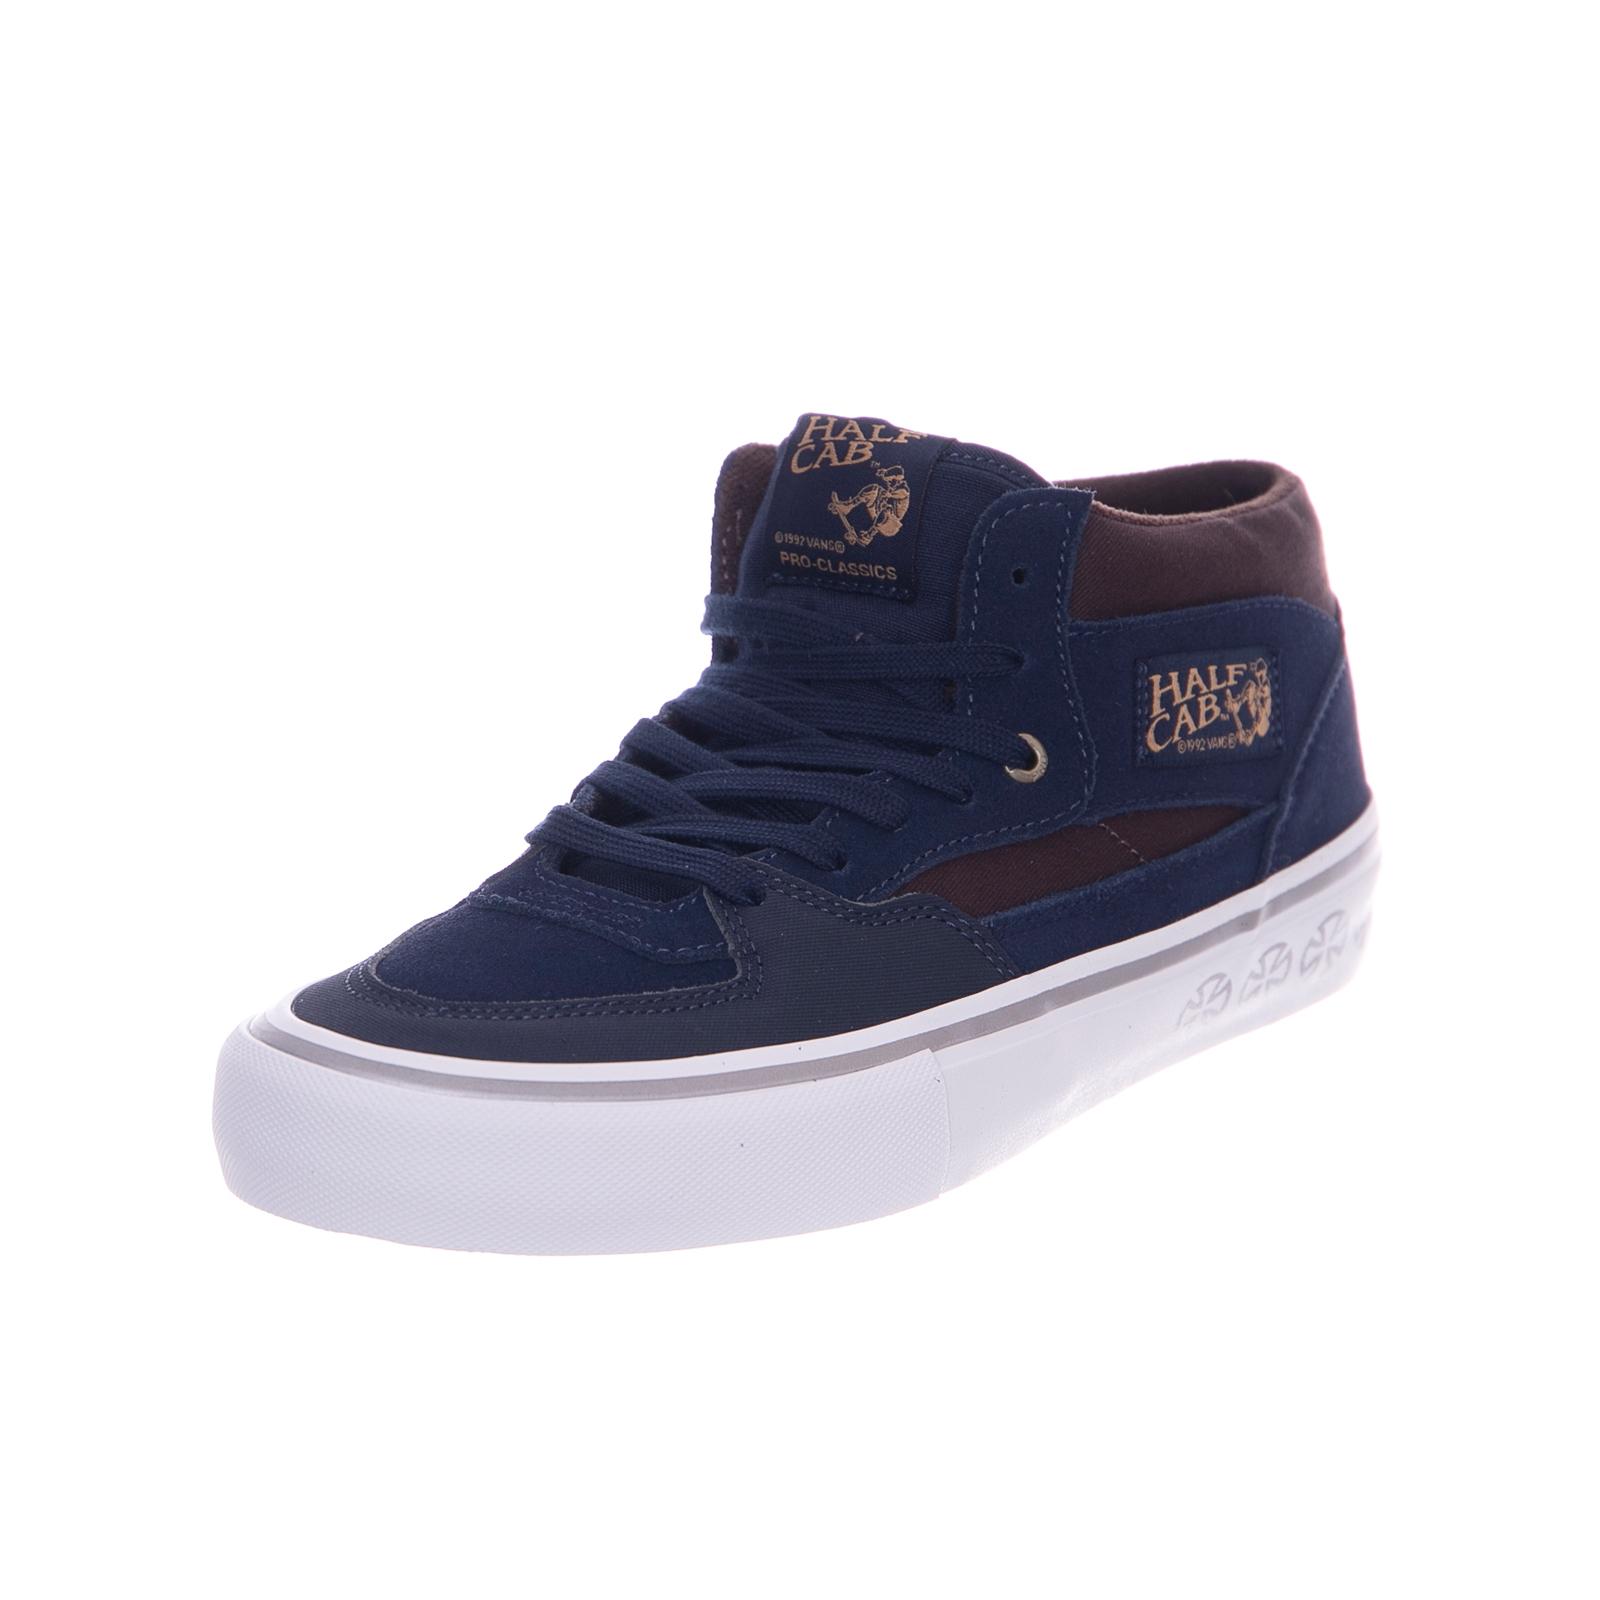 f60e3fd368 Vans Sneakers Half Cab Pro Independent Dress Blues Demitasse Multicolor